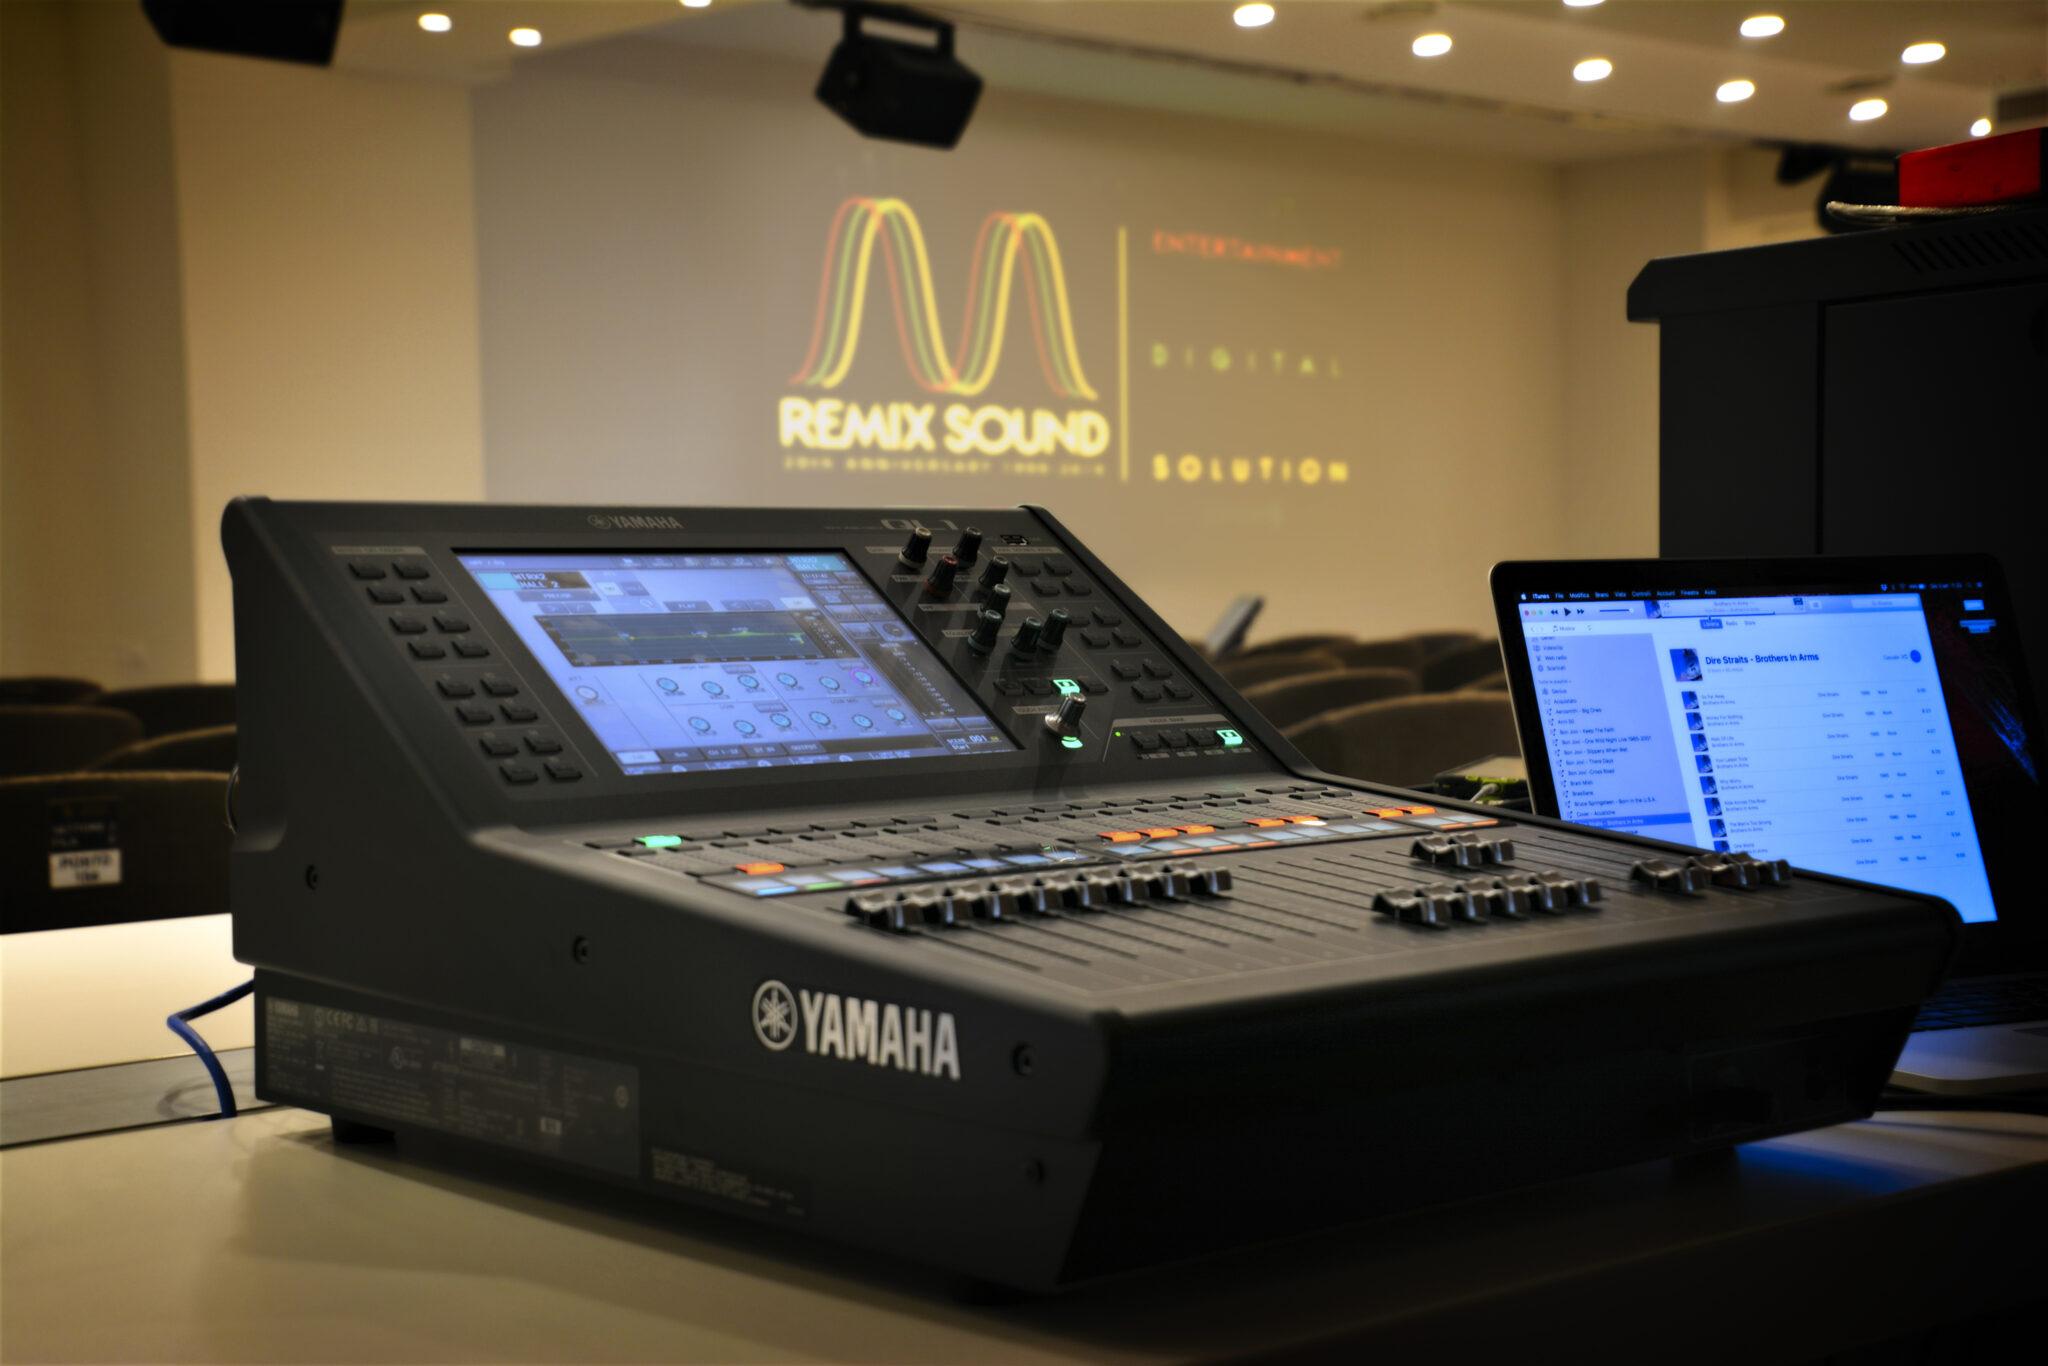 Yamaha Mendrisio